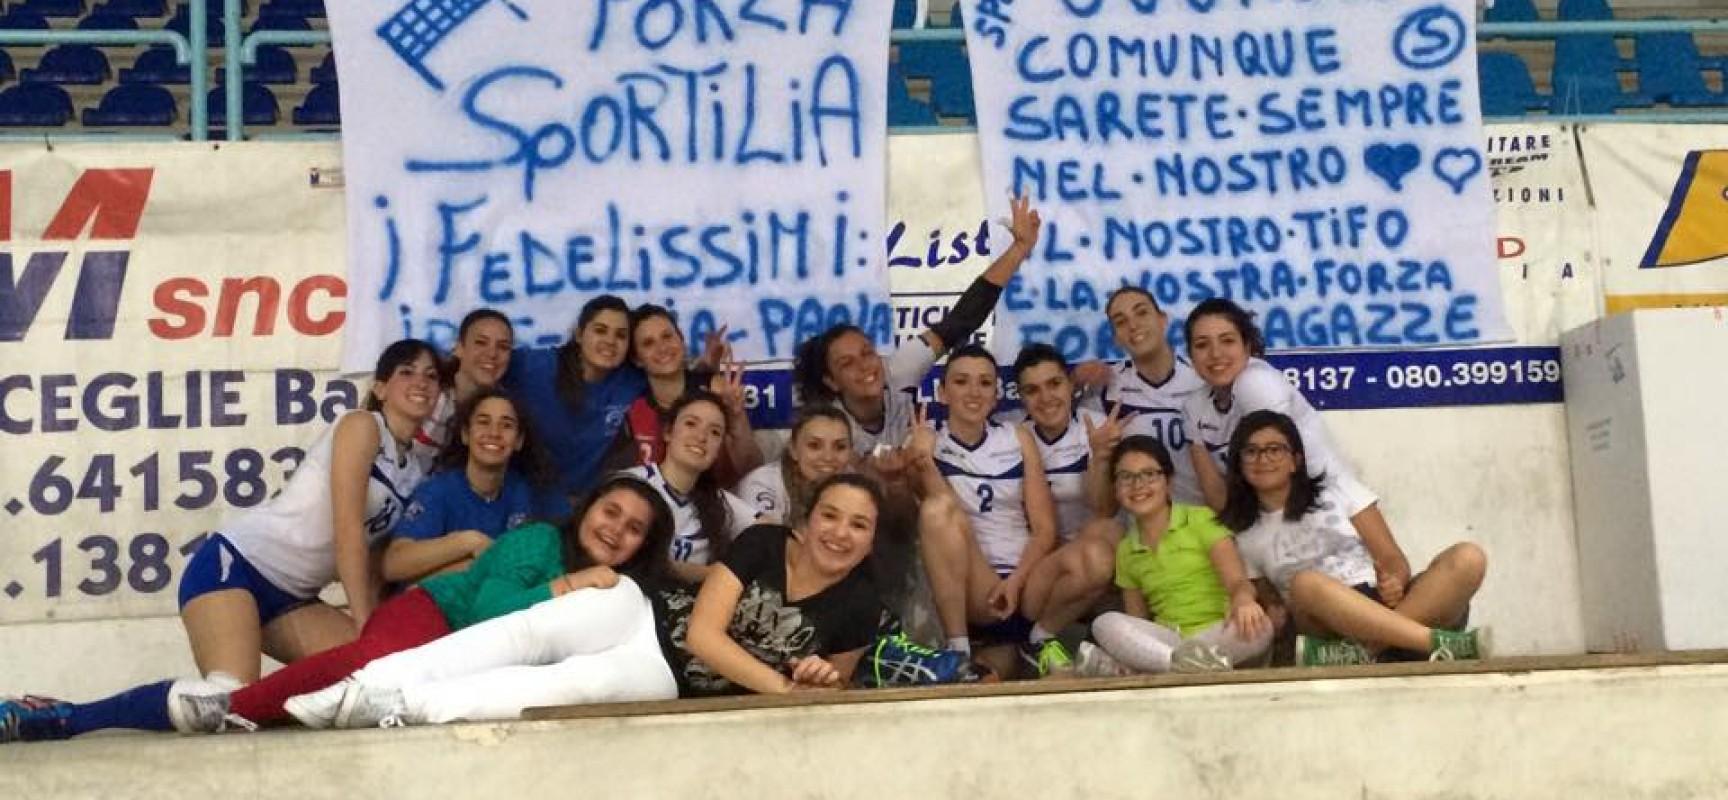 Sportilia, un week-end ricco di soddisfazioni